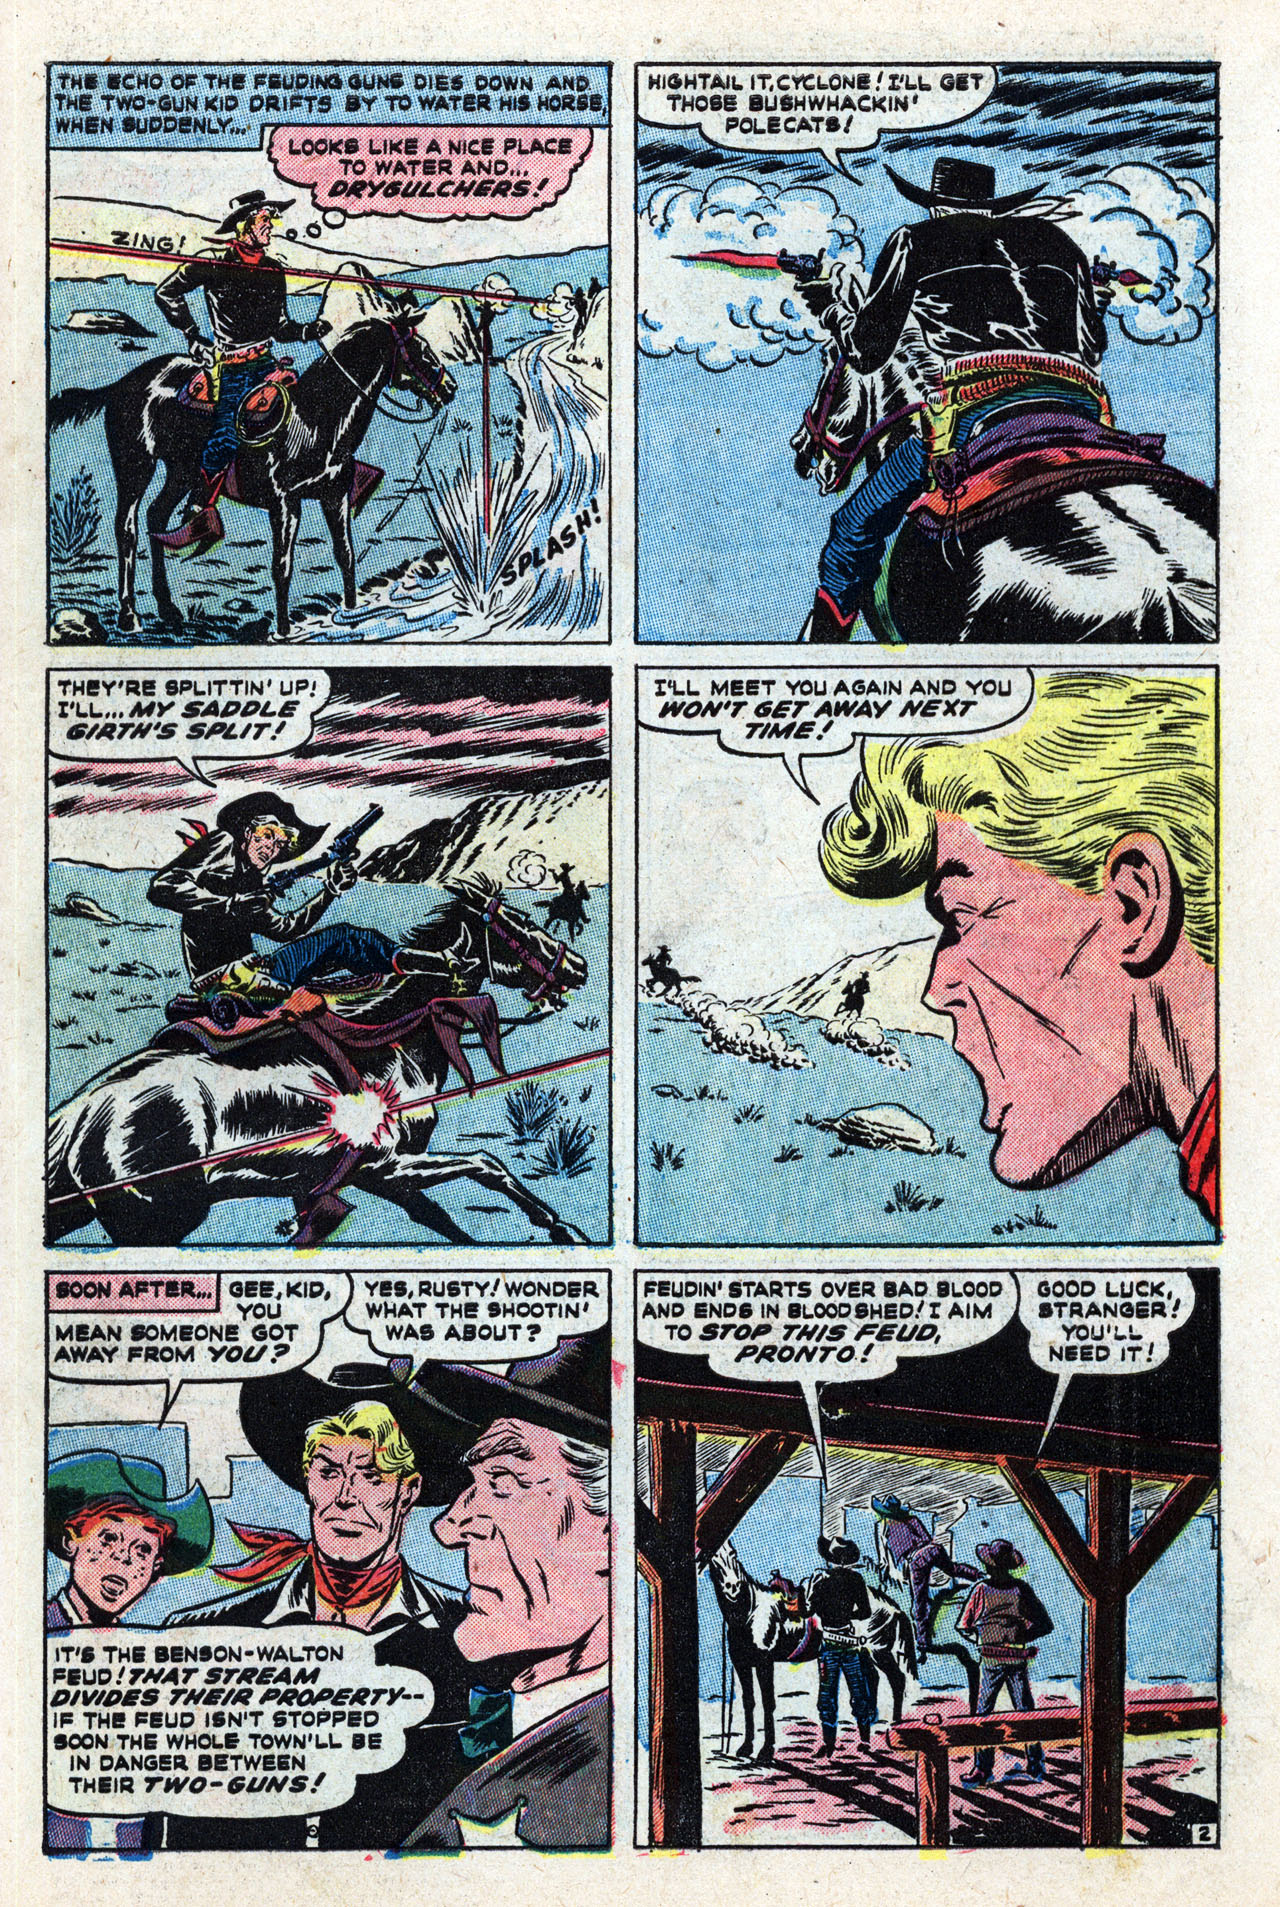 Read online Two-Gun Kid comic -  Issue #10 - 41